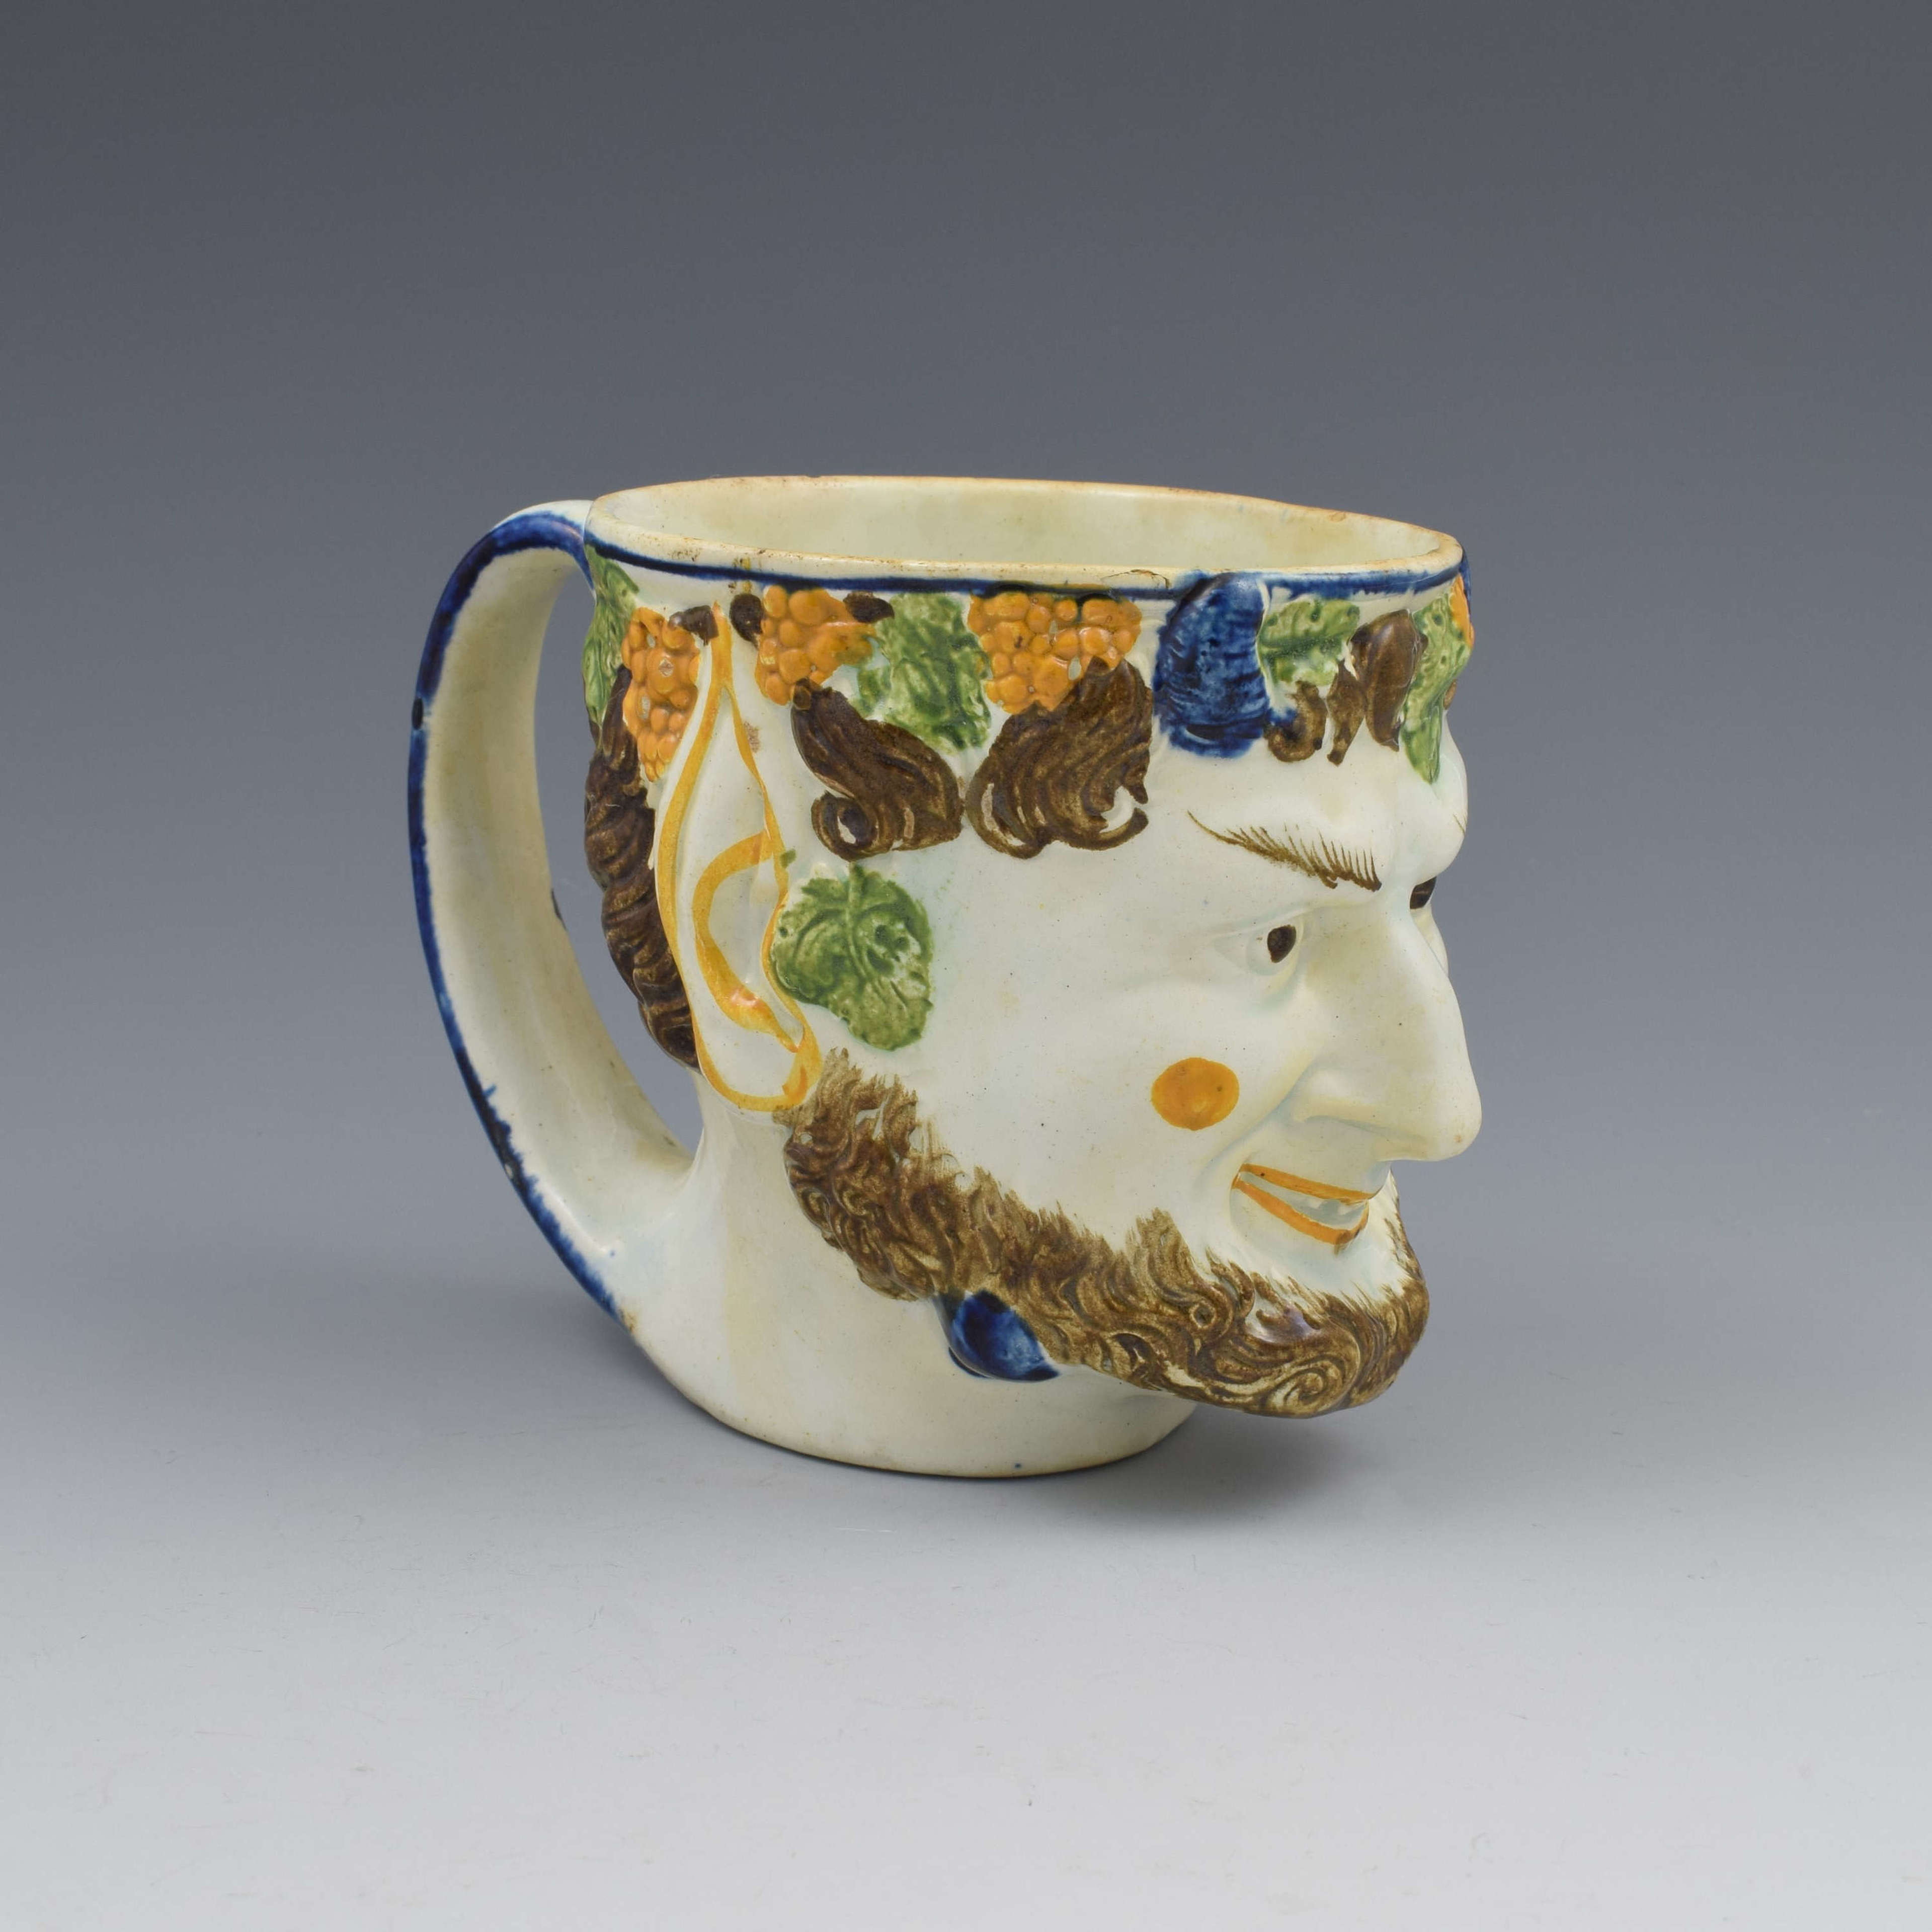 Staffordshire Prattware Pearlware Bacchus / Satyr Mug c.1800